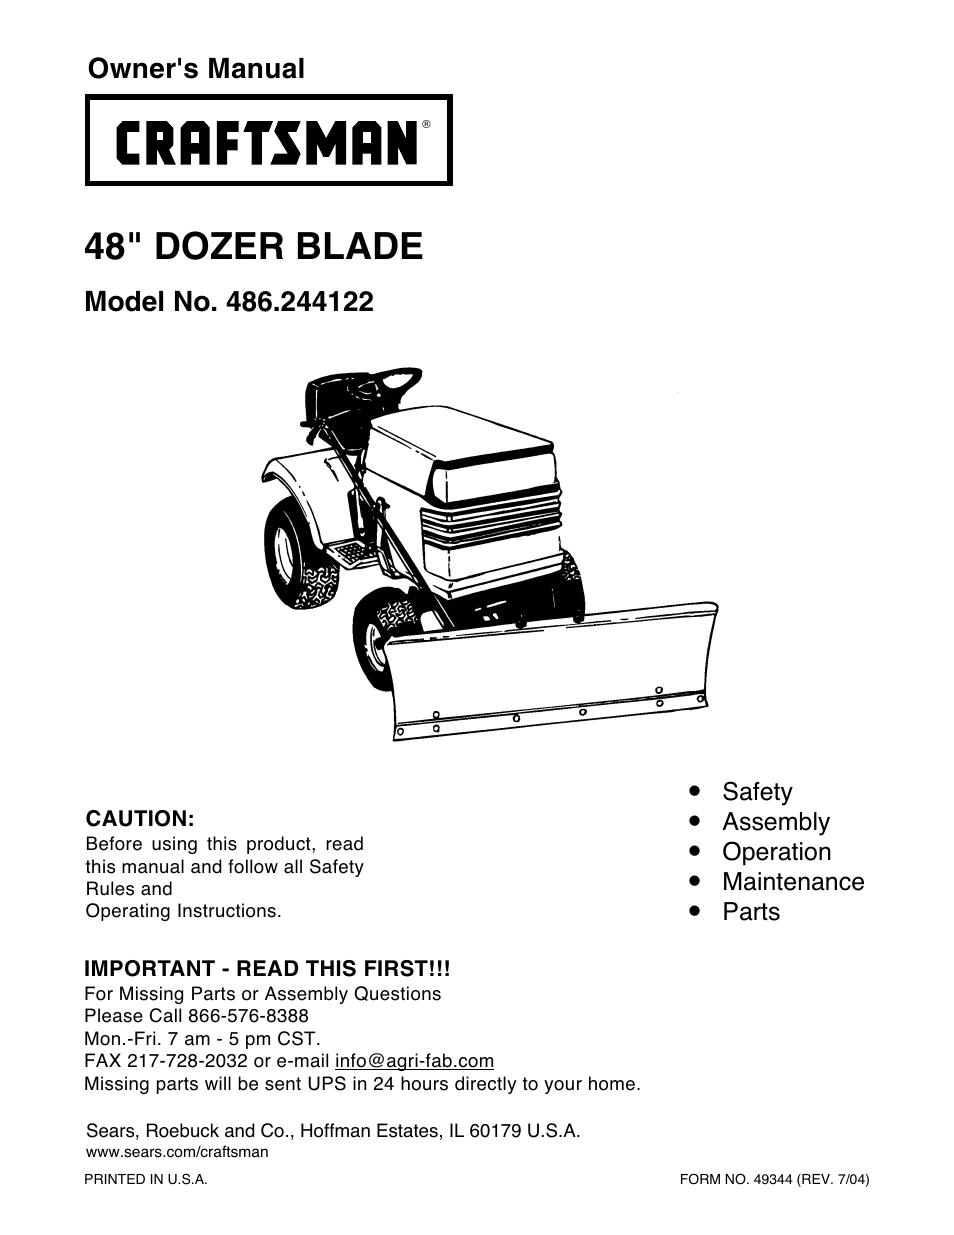 craftsman 486 244122 user manual 16 pages rh manualsdir com Craftsman Instruction Manual Craftsman Snow Thrower Manual